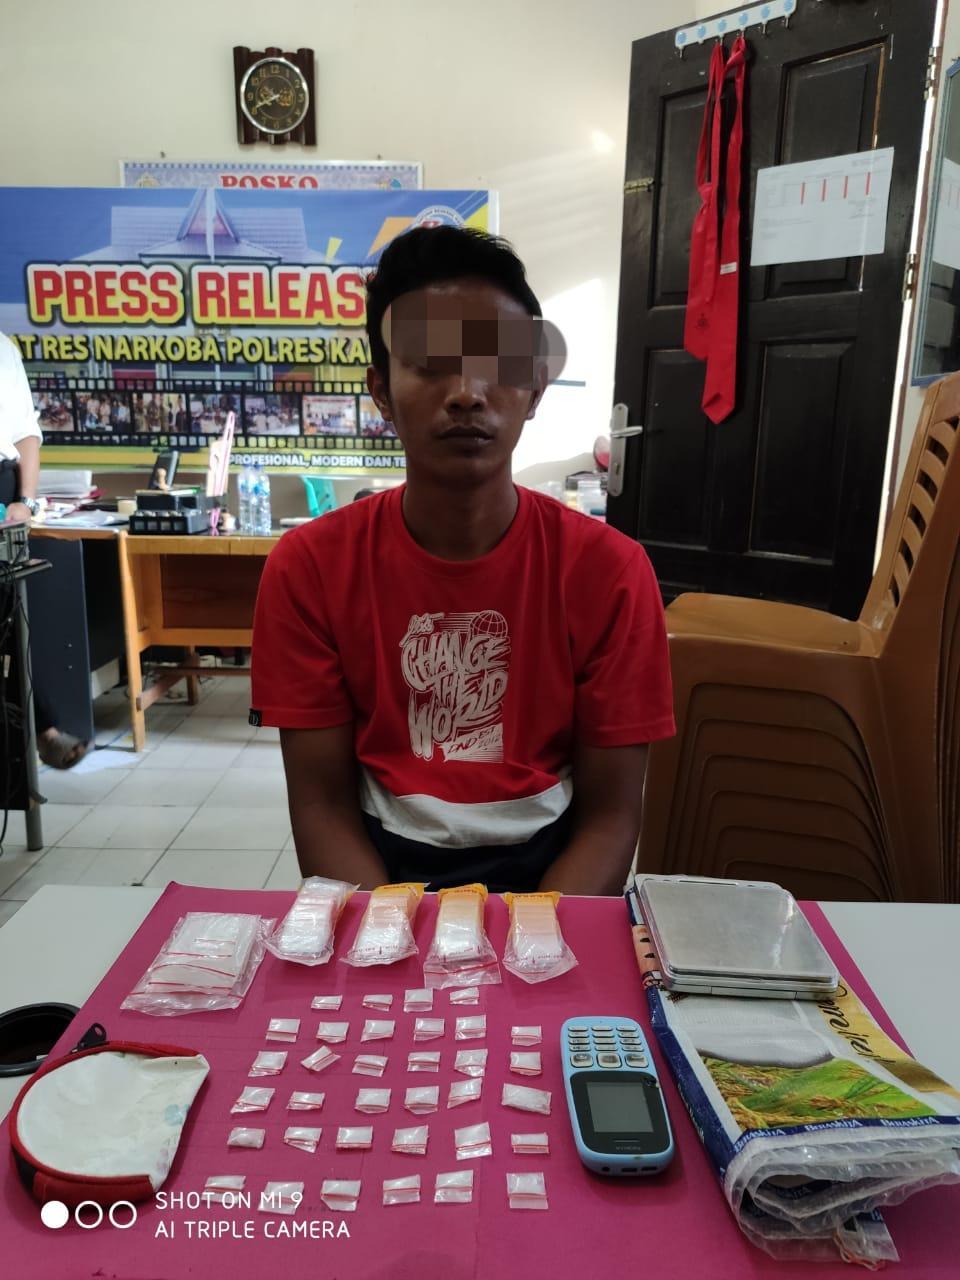 Diduga Sering Jual Narkoba kepada Pelajar, Warga Desa Ranah Kampar ini Ditangkap Polisi